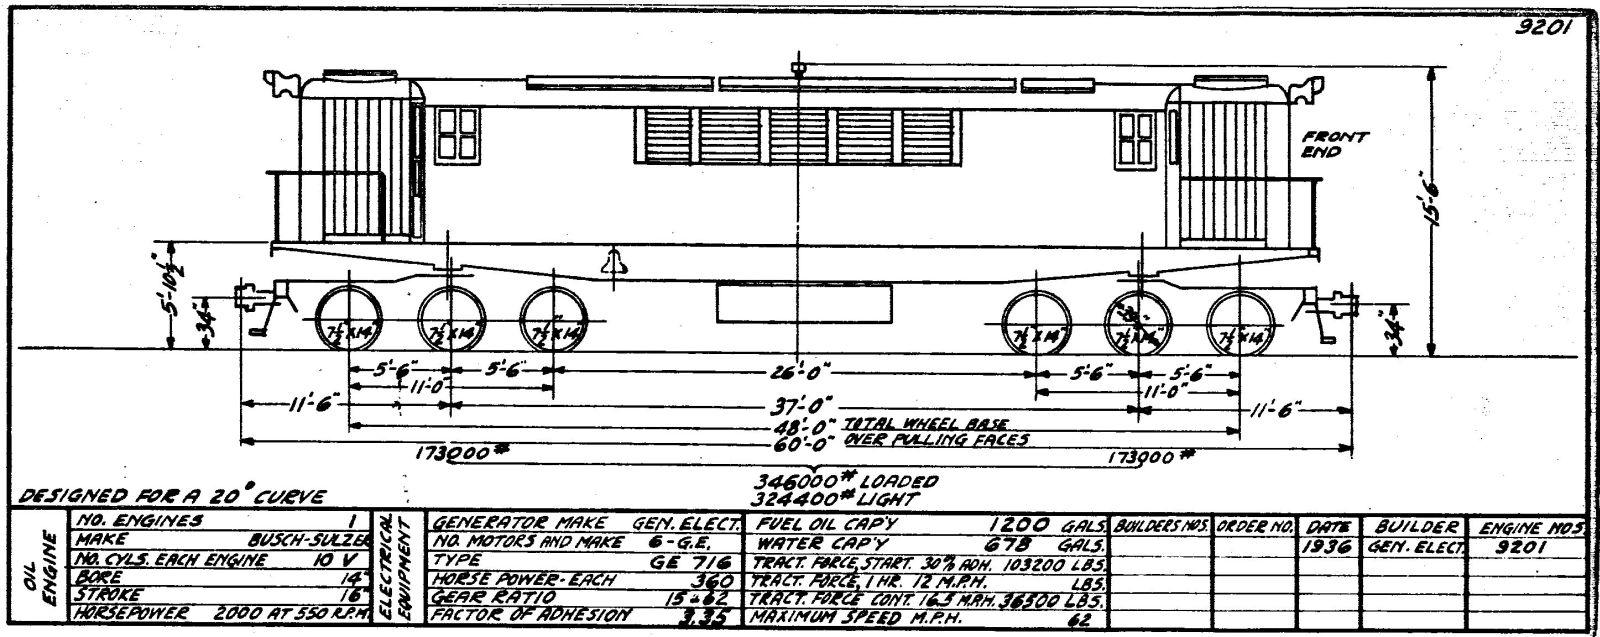 hight resolution of 83 locomotives c iw 801 802 84 locomotives c iw 803 804